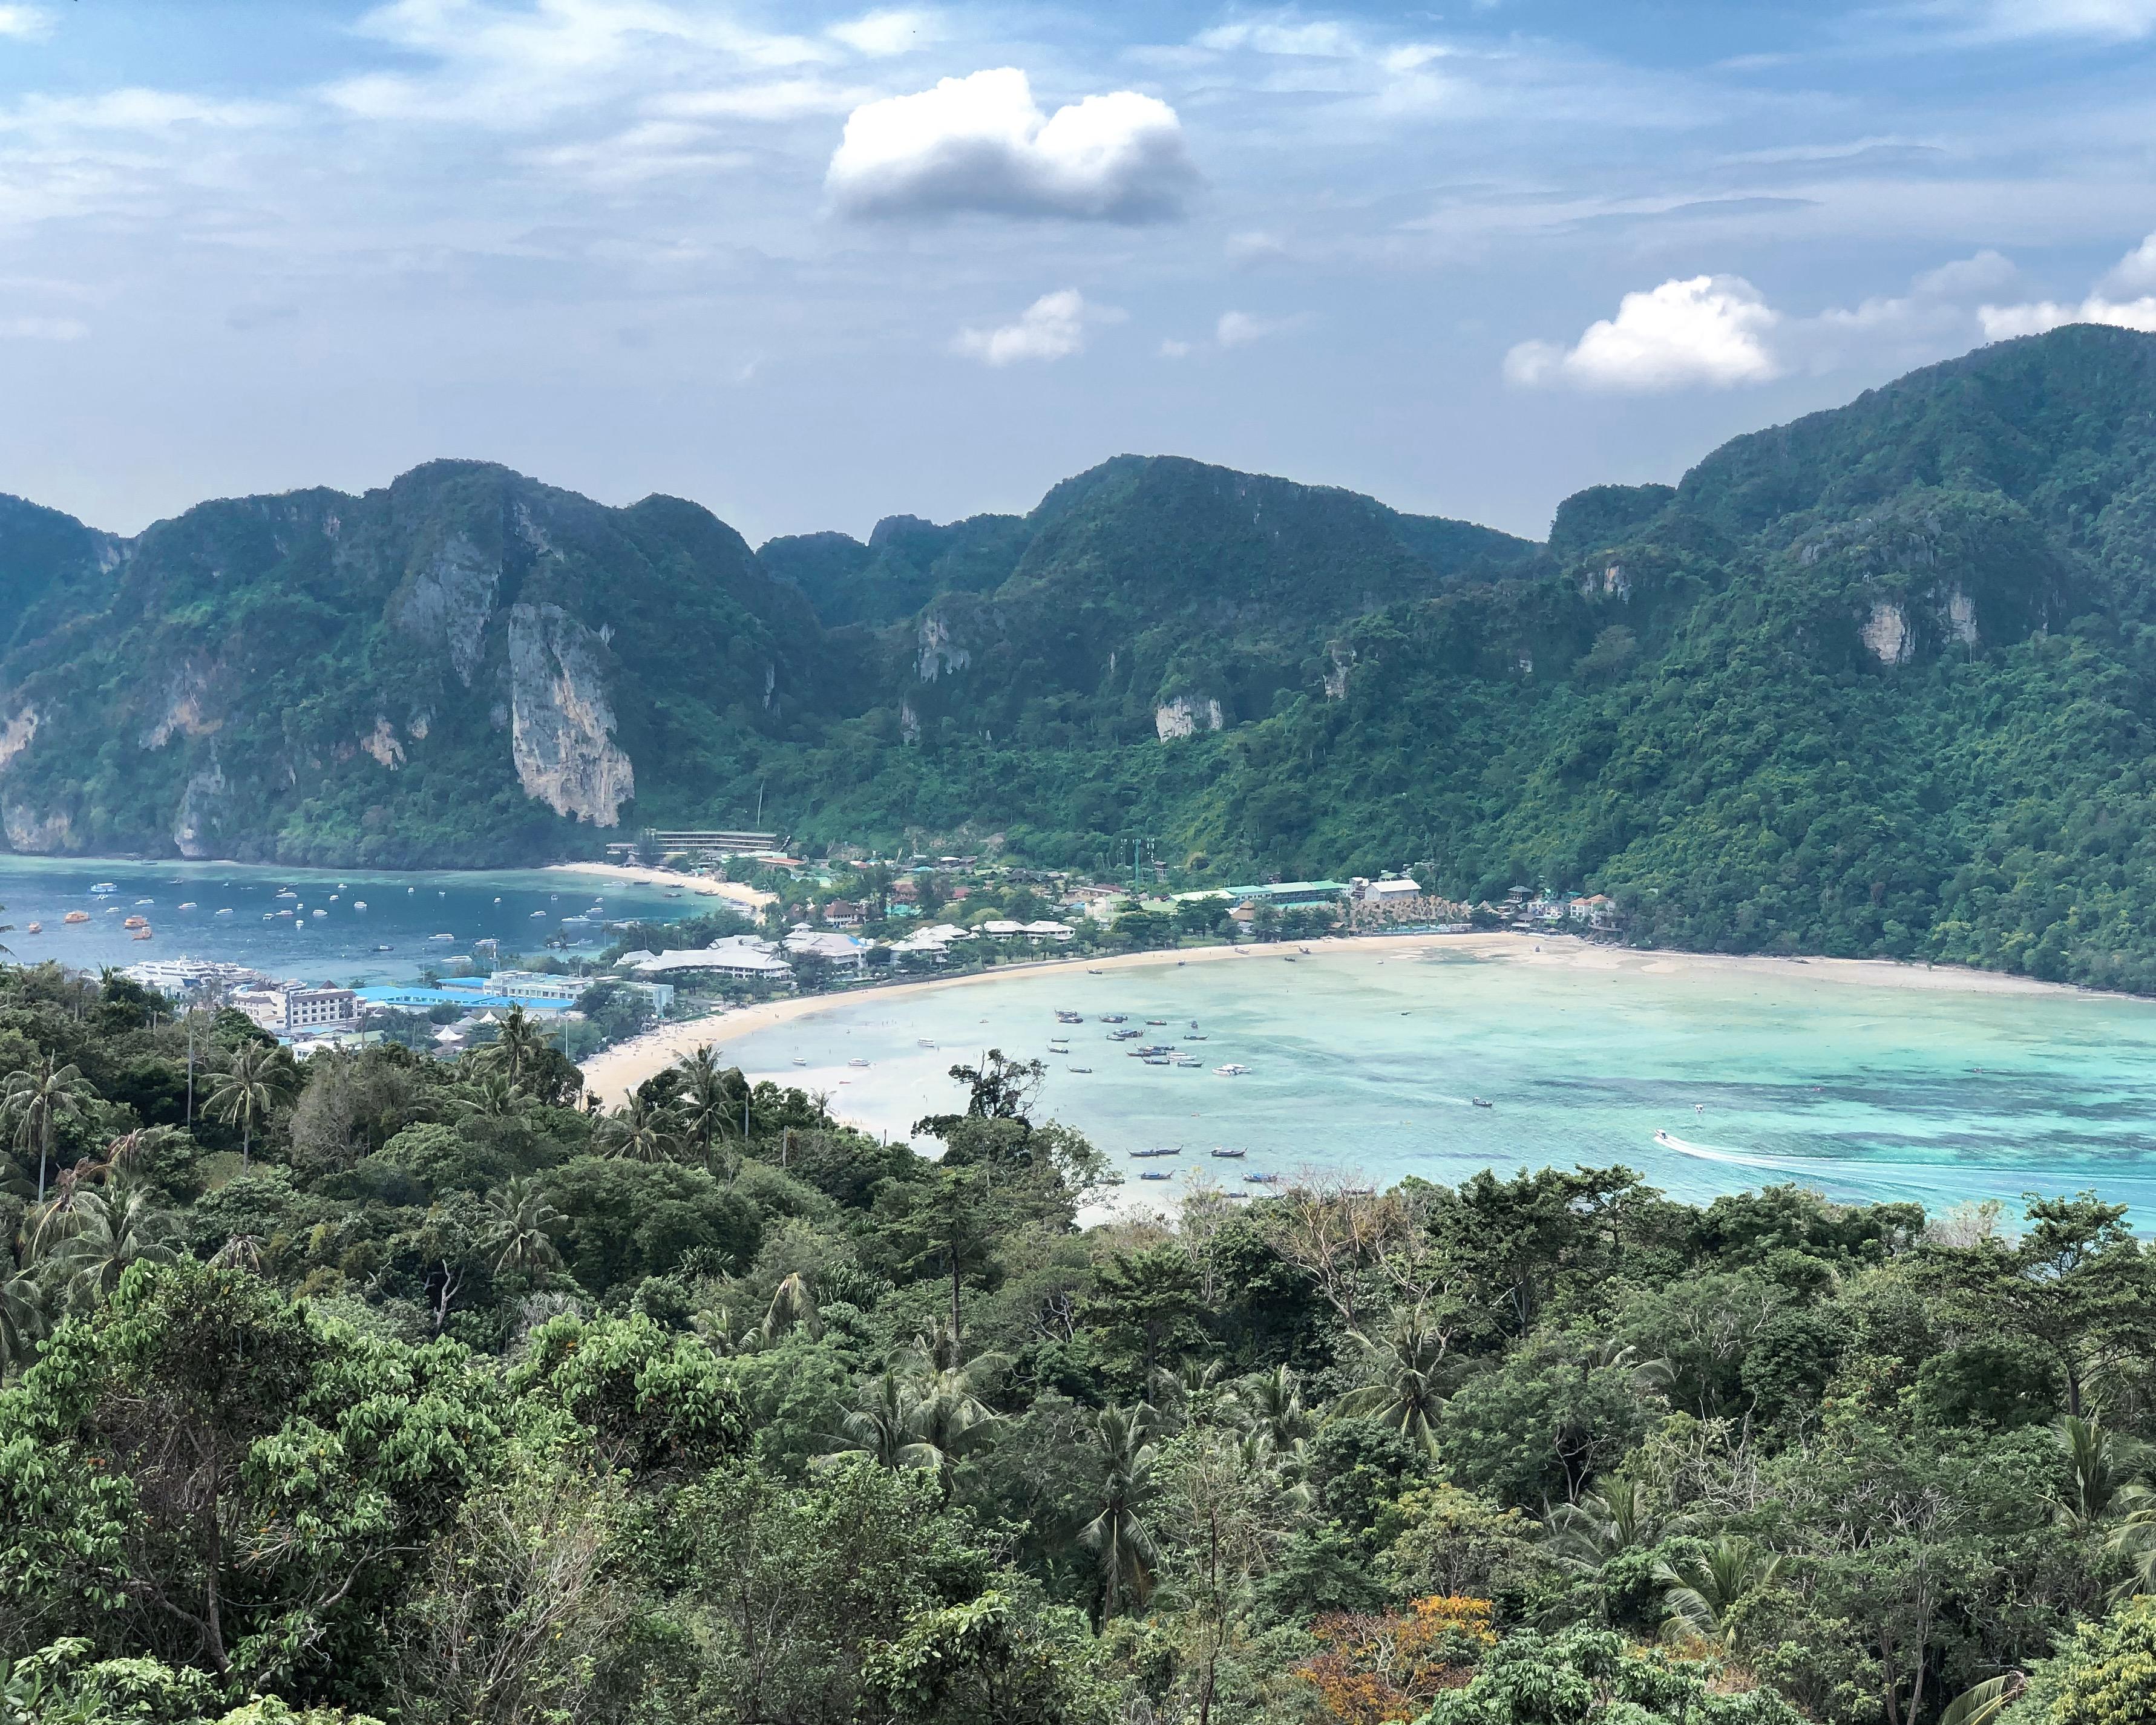 Thaïlande #05 Perdu dans la jungle